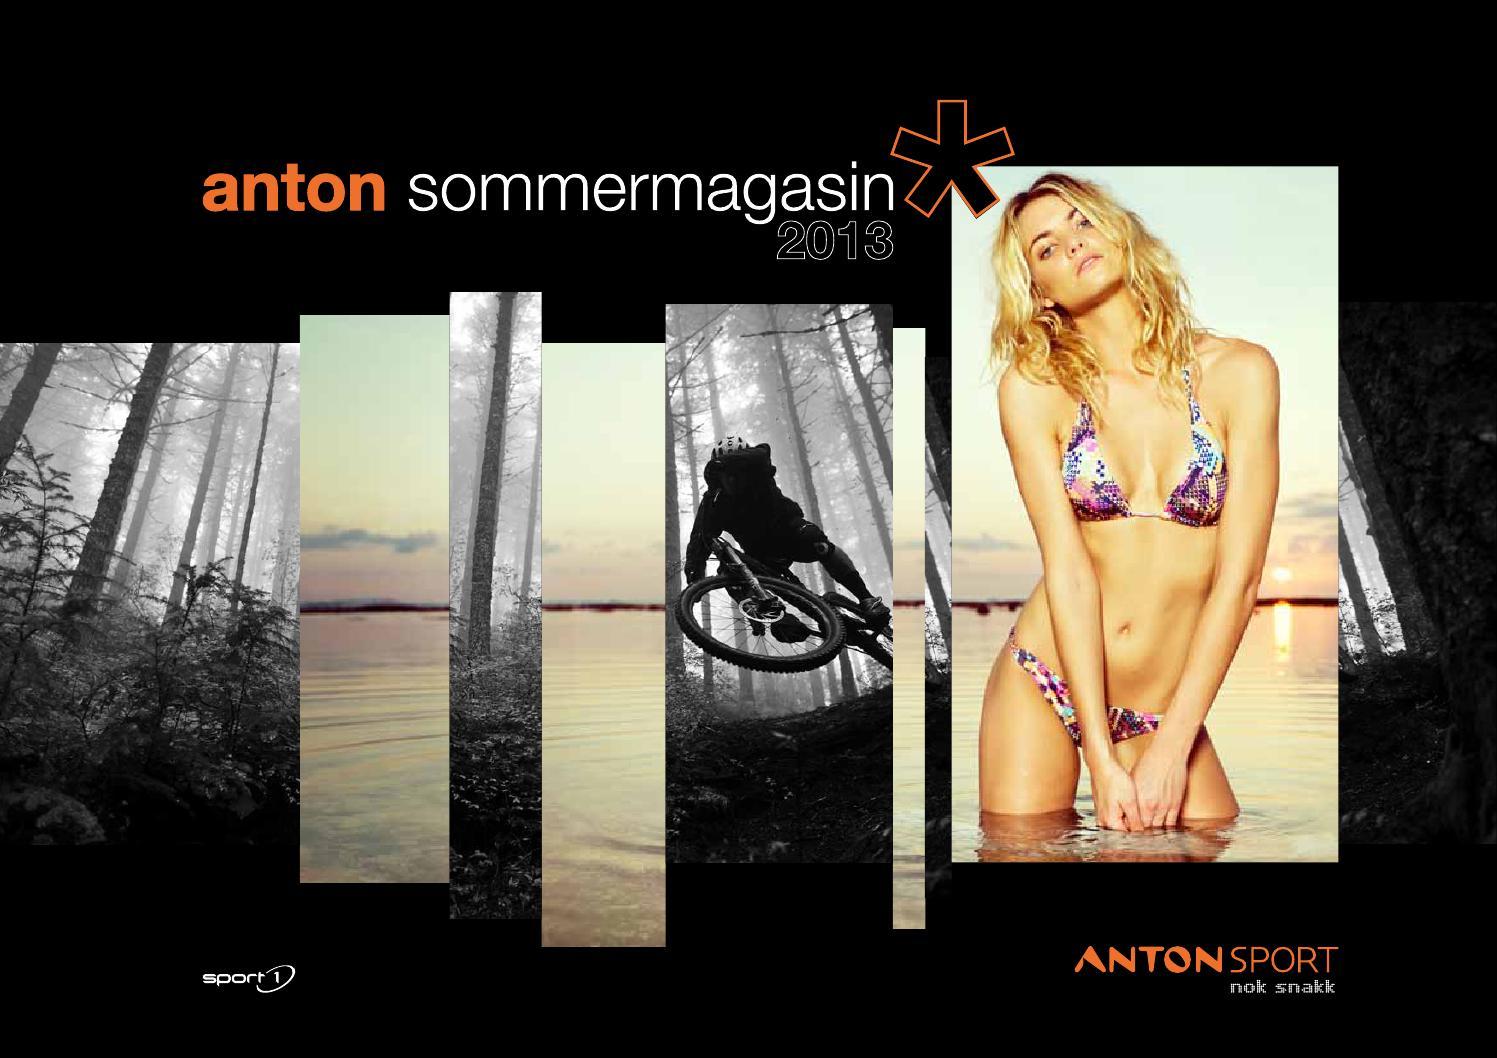 2bfe4c5f58c9 Anton sport summer 2013 by INK DESIGN - issuu